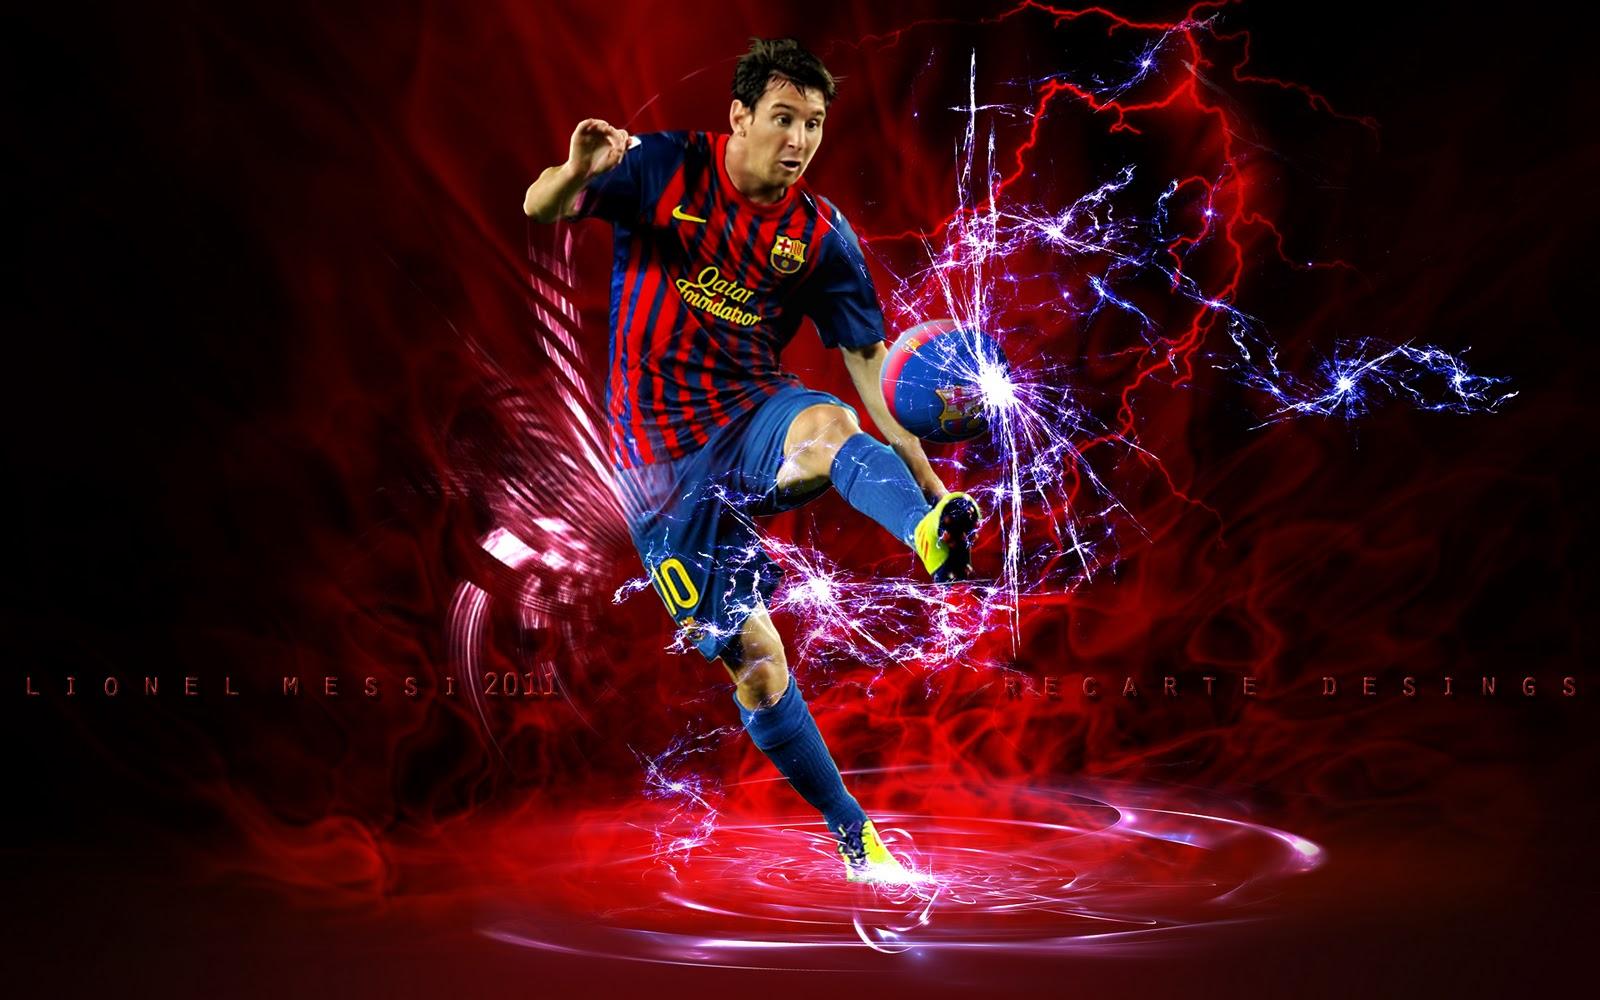 Lionel Messi Wallpaper 1600x1000